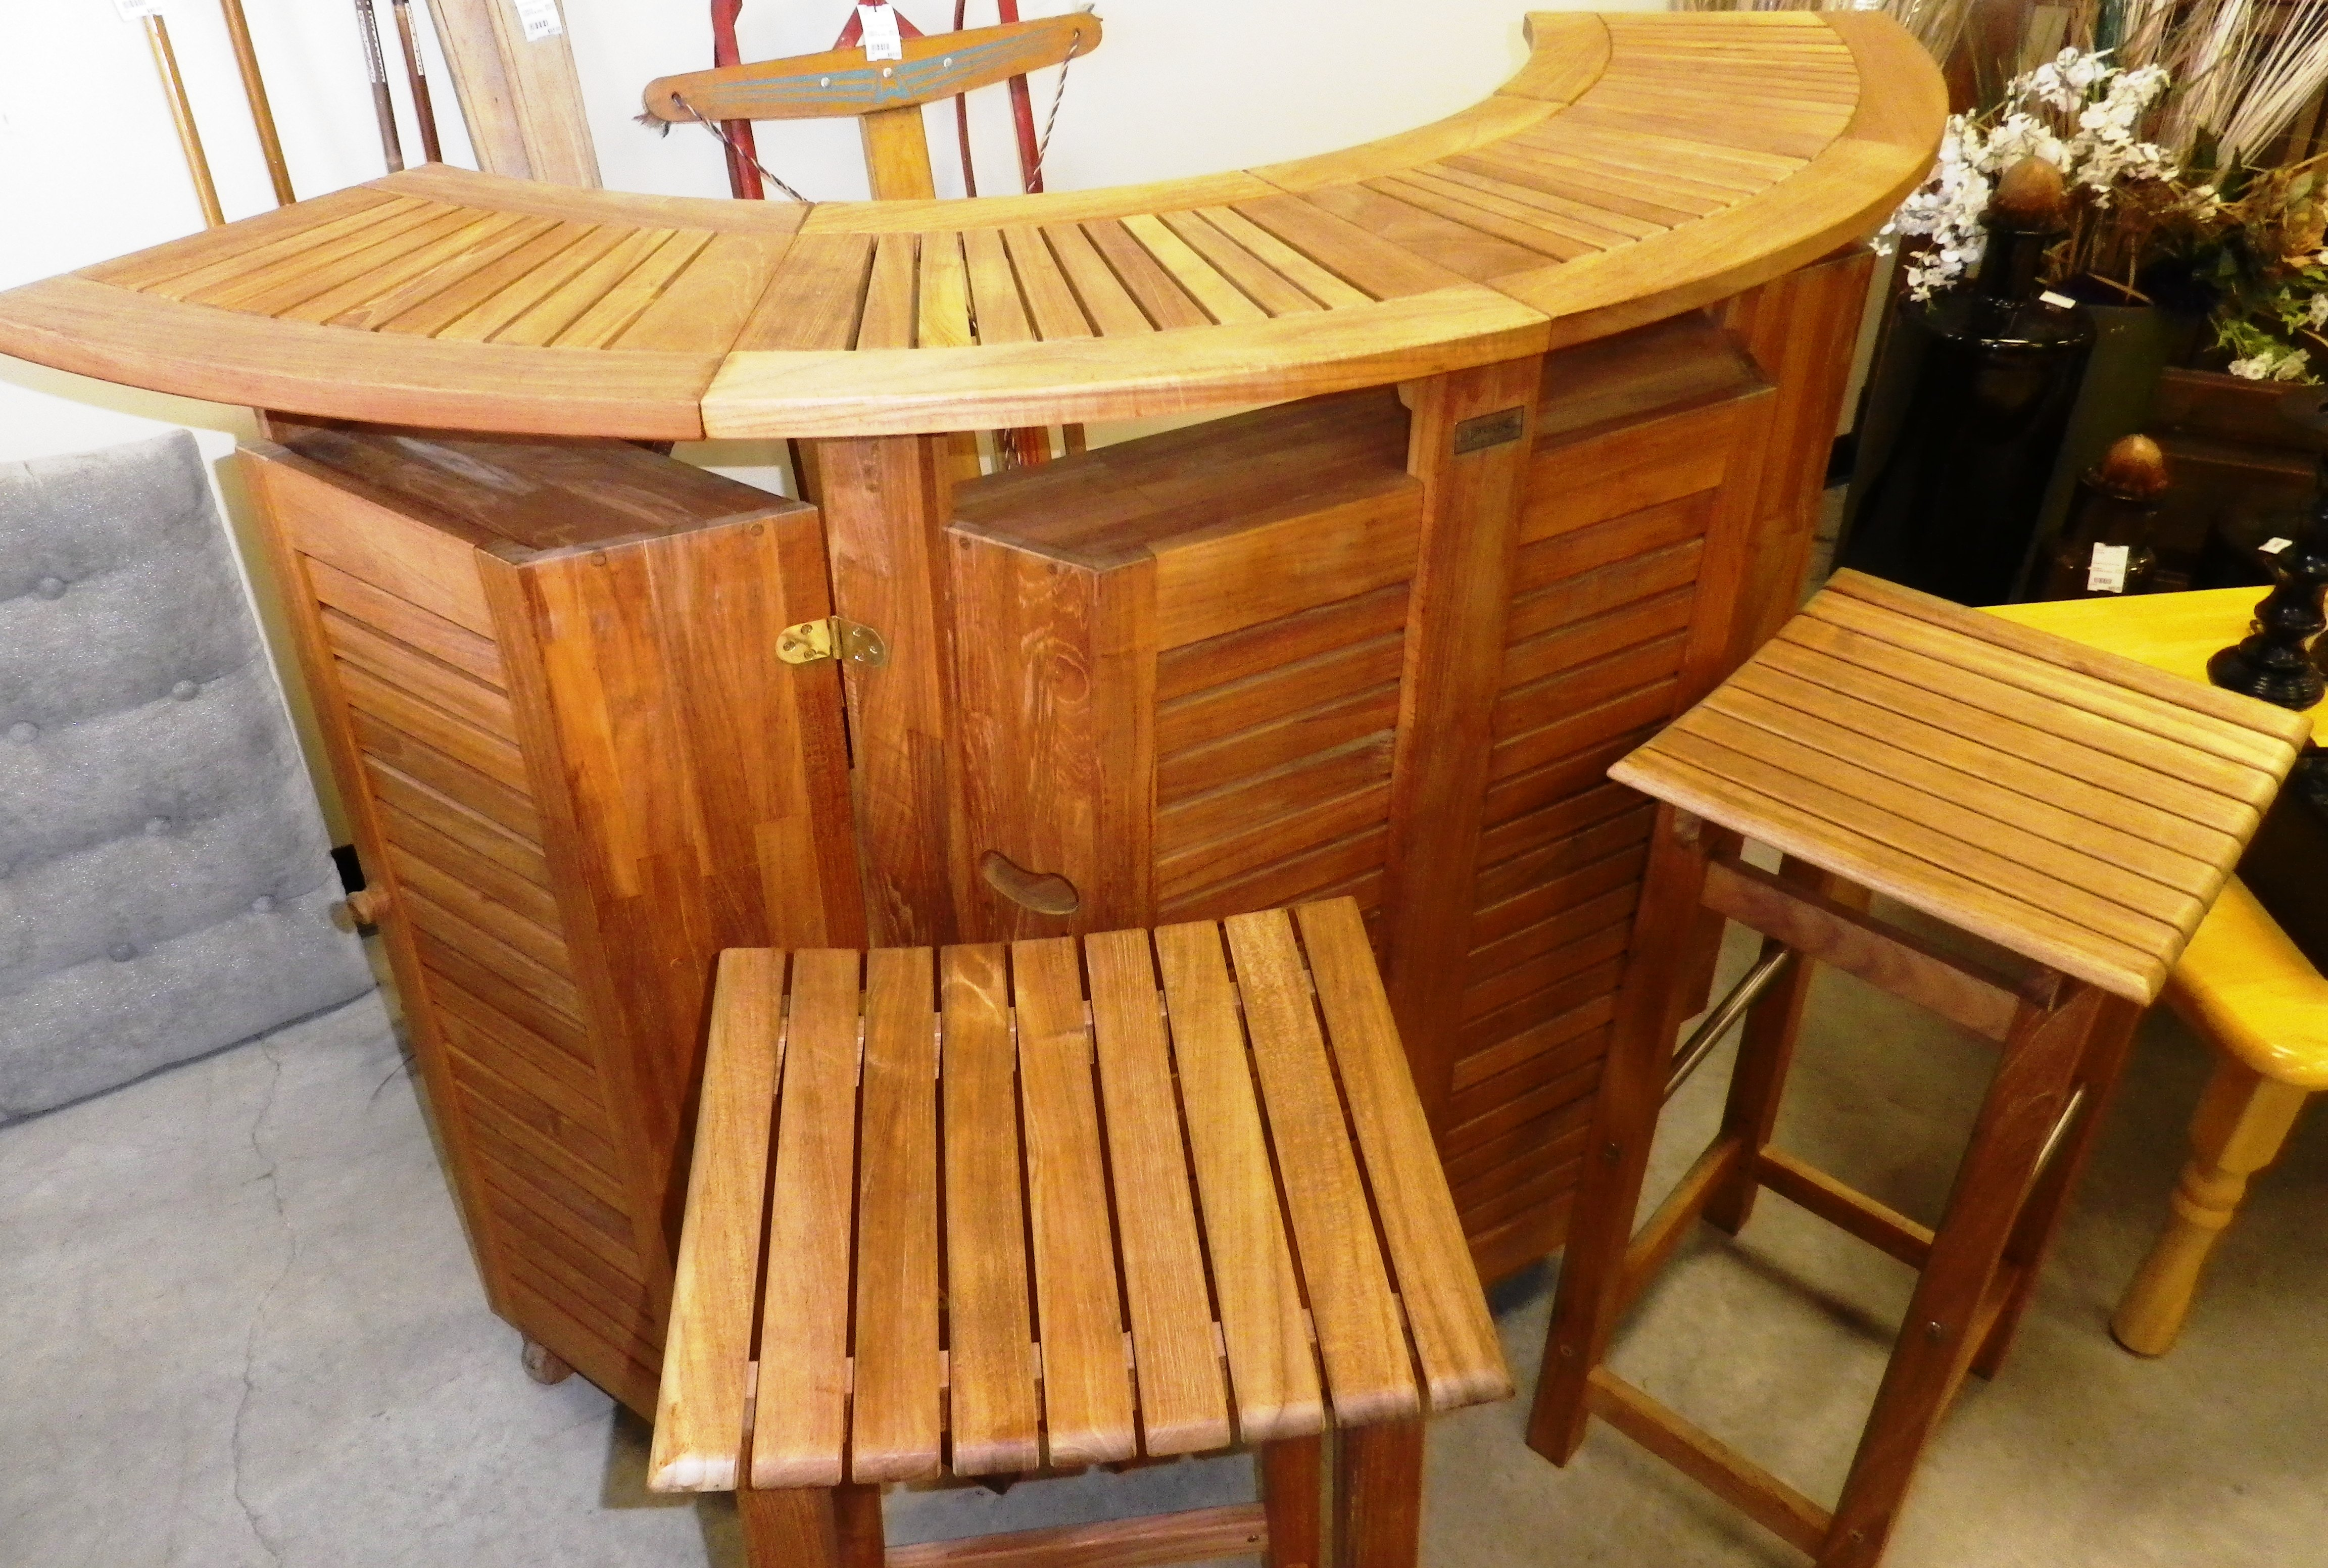 Portable Teak Bar C W 2 Counter Stools Sold